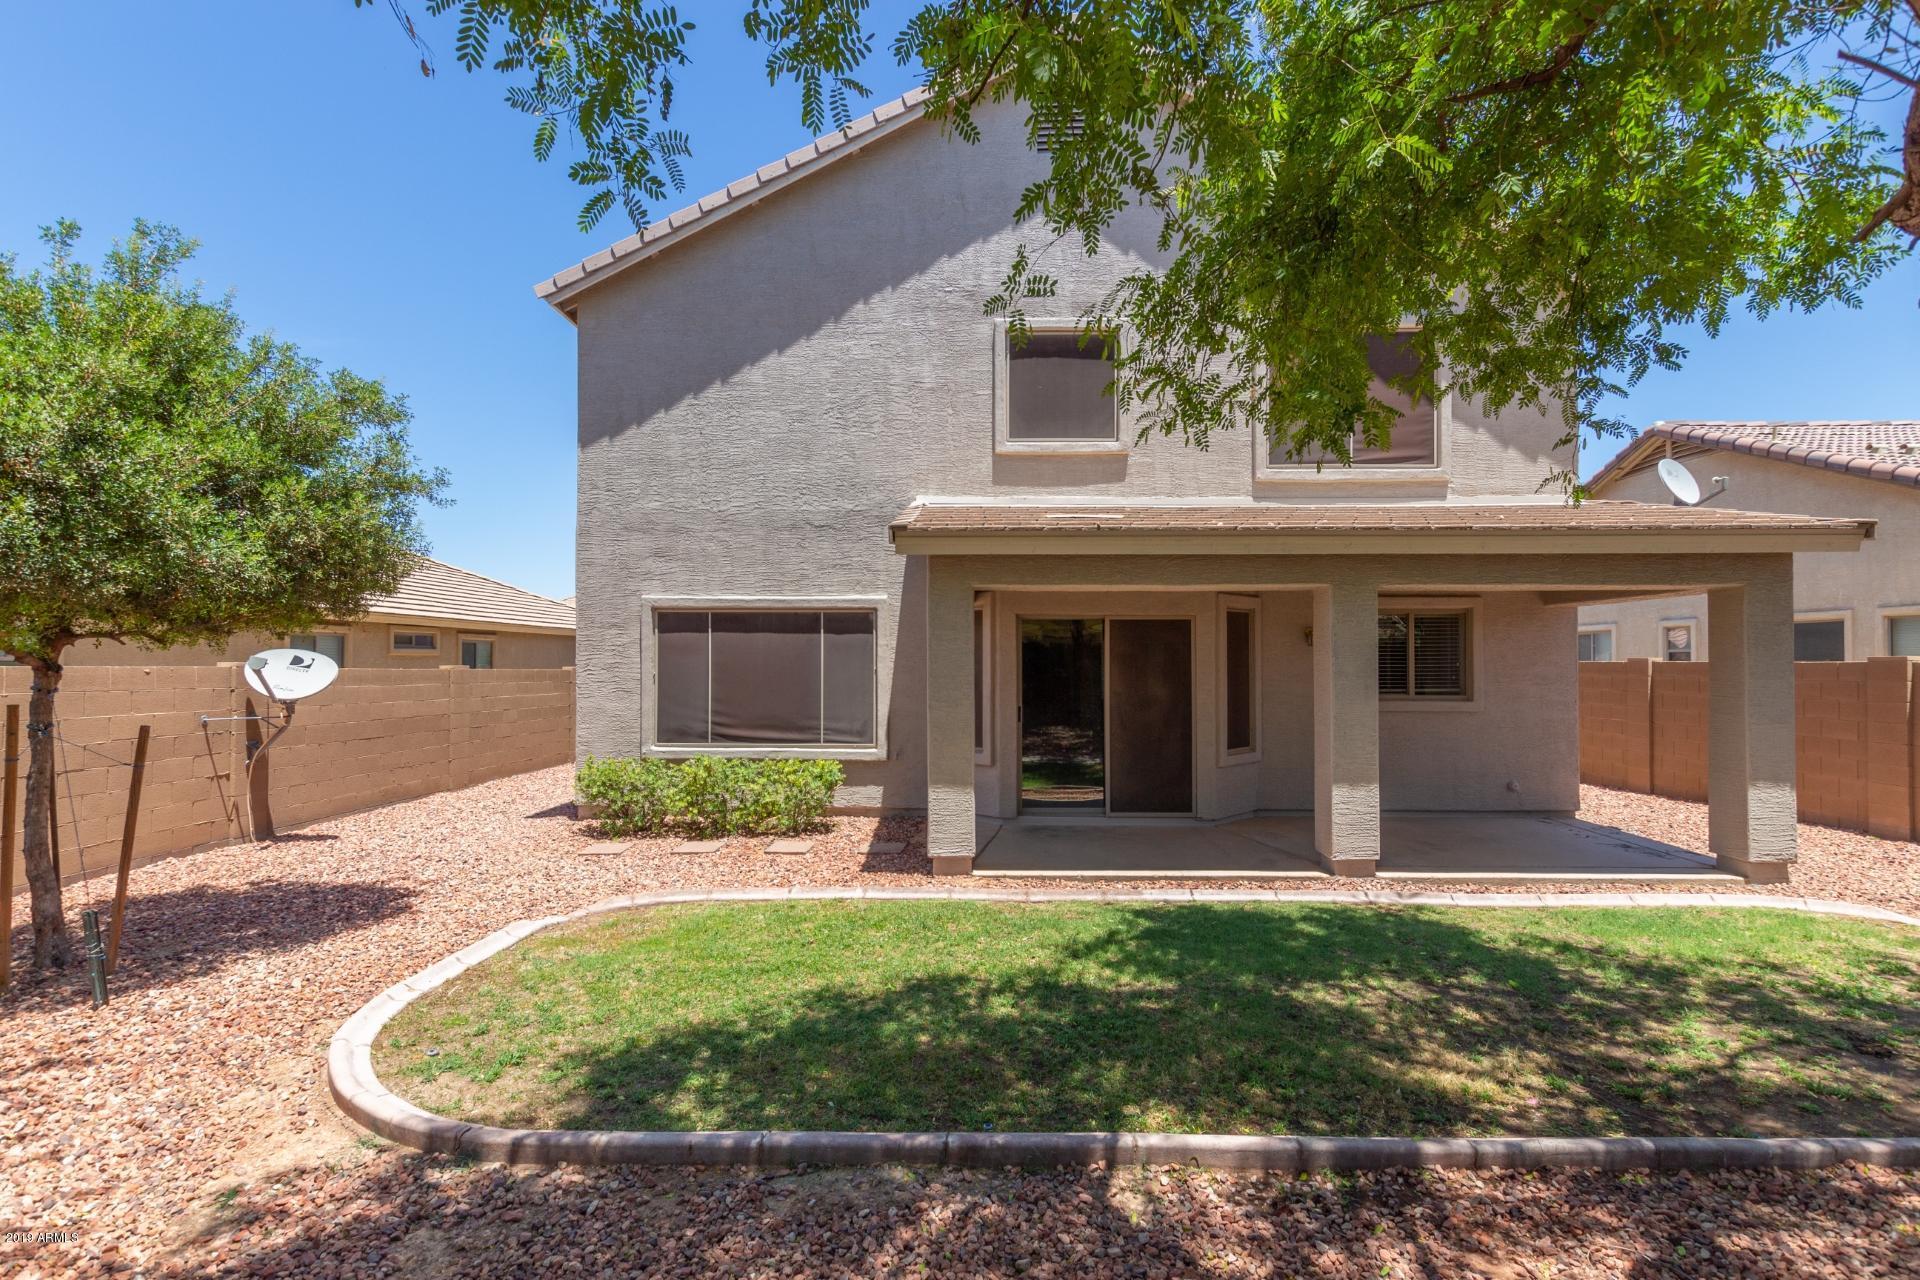 MLS 5943264 3543 E ANIKA Drive, Gilbert, AZ Gilbert AZ Marbella Vineyards